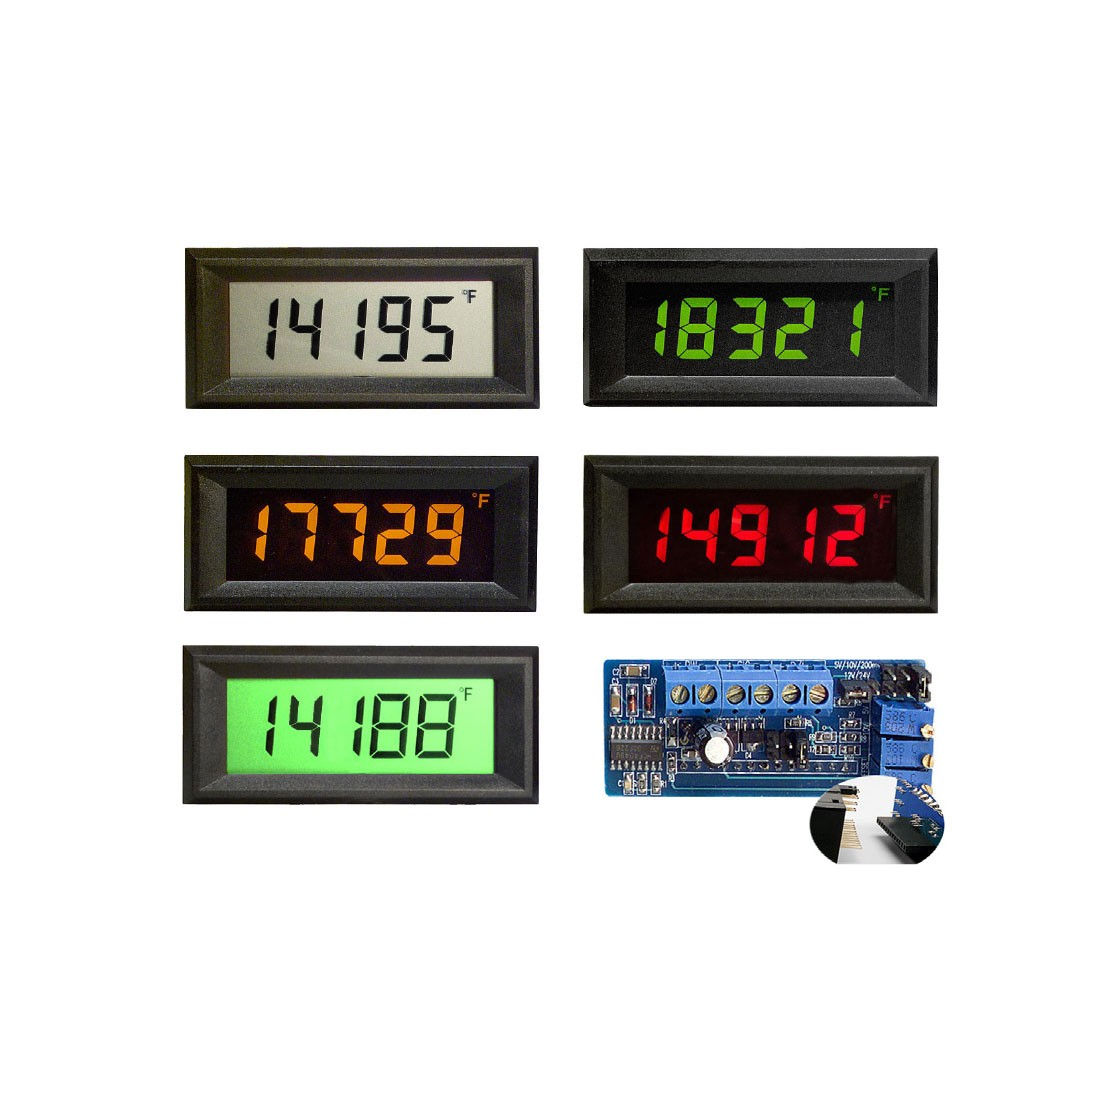 HVPI-4E Series Voltage Powered LCD Digital Panel Meter